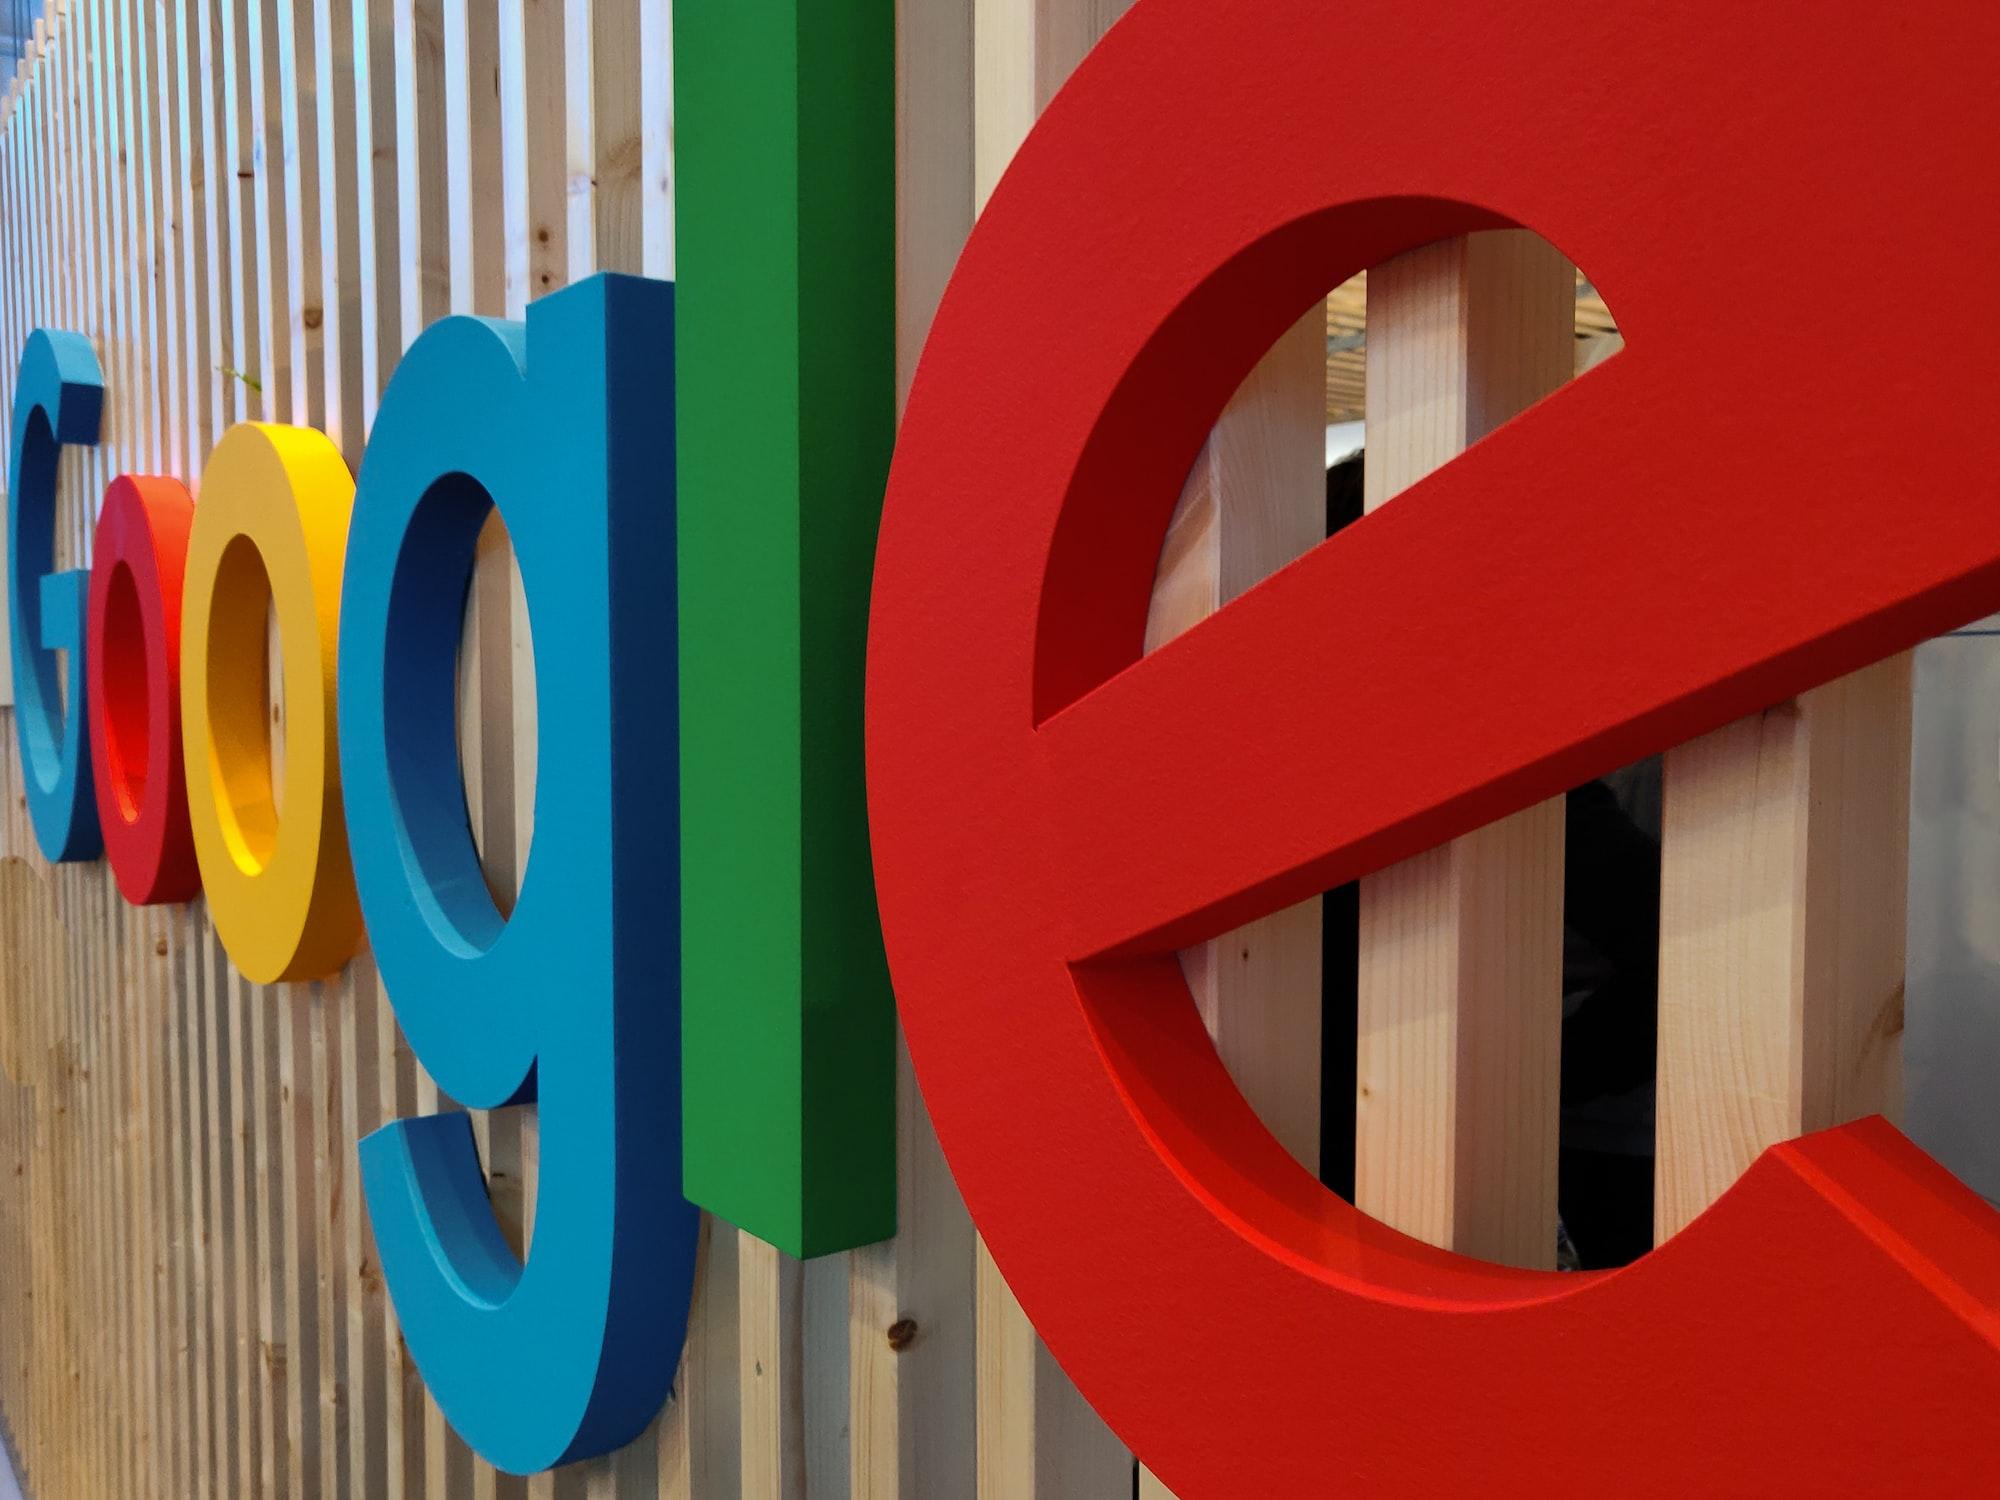 Google's Privacy Slip Ups Could Cost Them $5 Billion